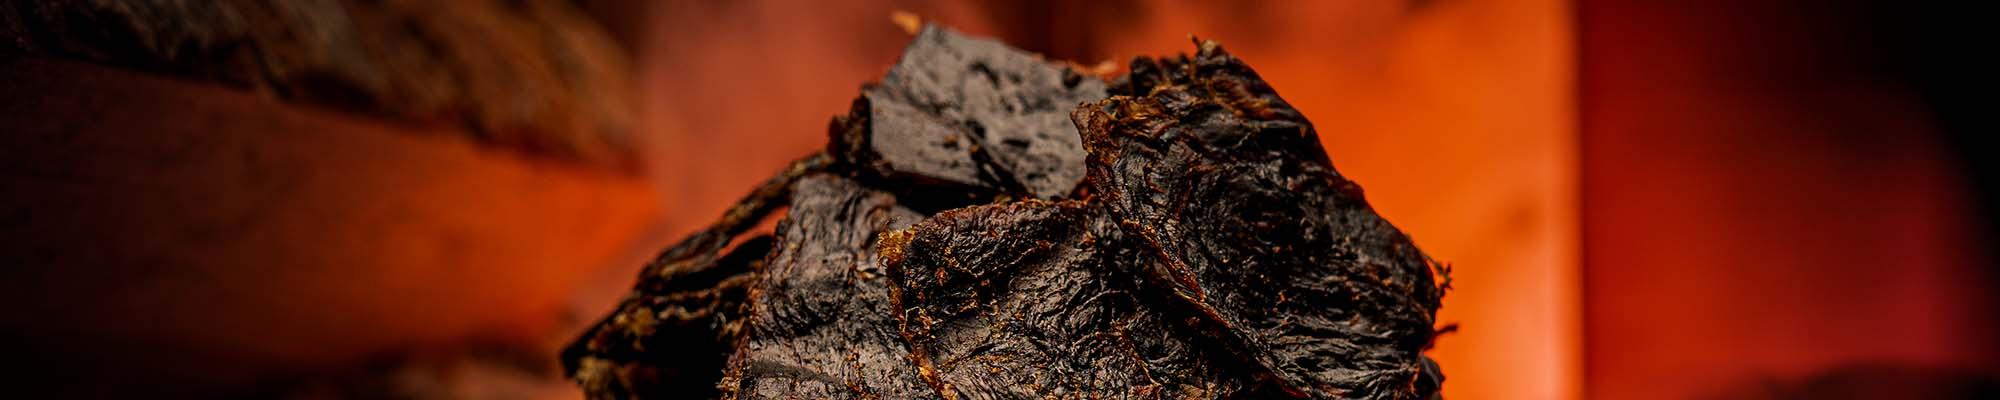 kuivalihakundi kuivaliha beef jerky jerkku